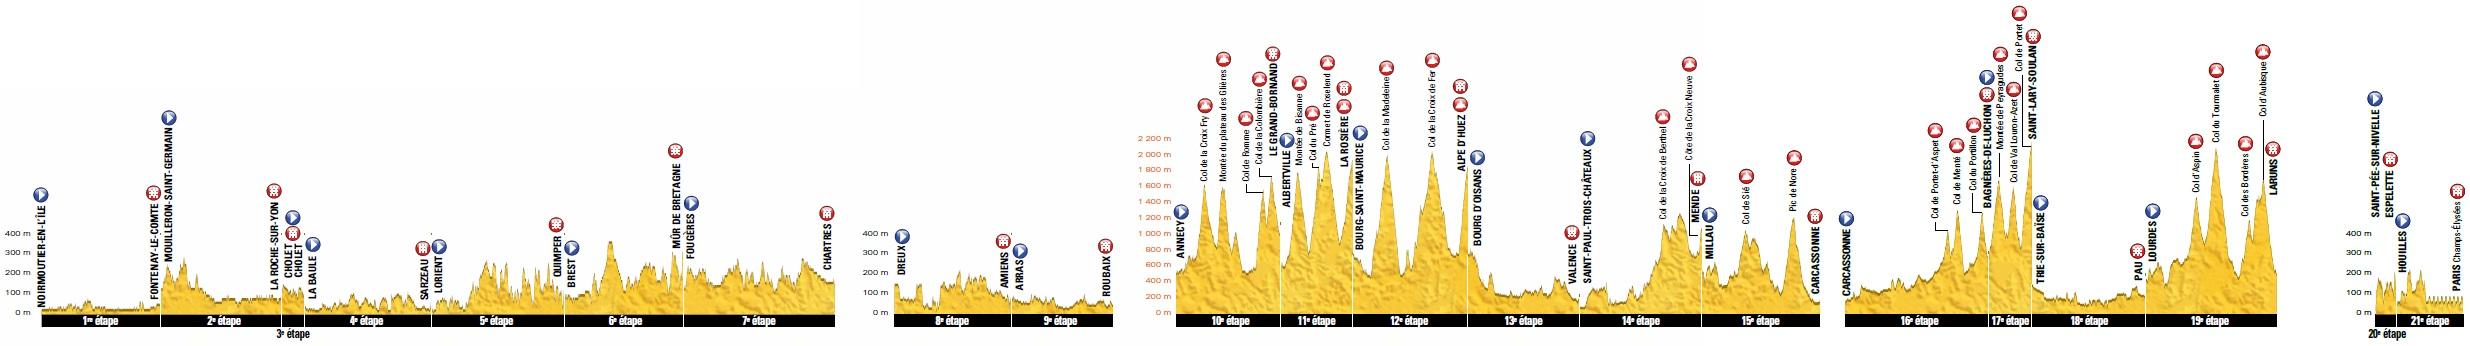 Präsentation Tour de France 2018: Gesamtprofil